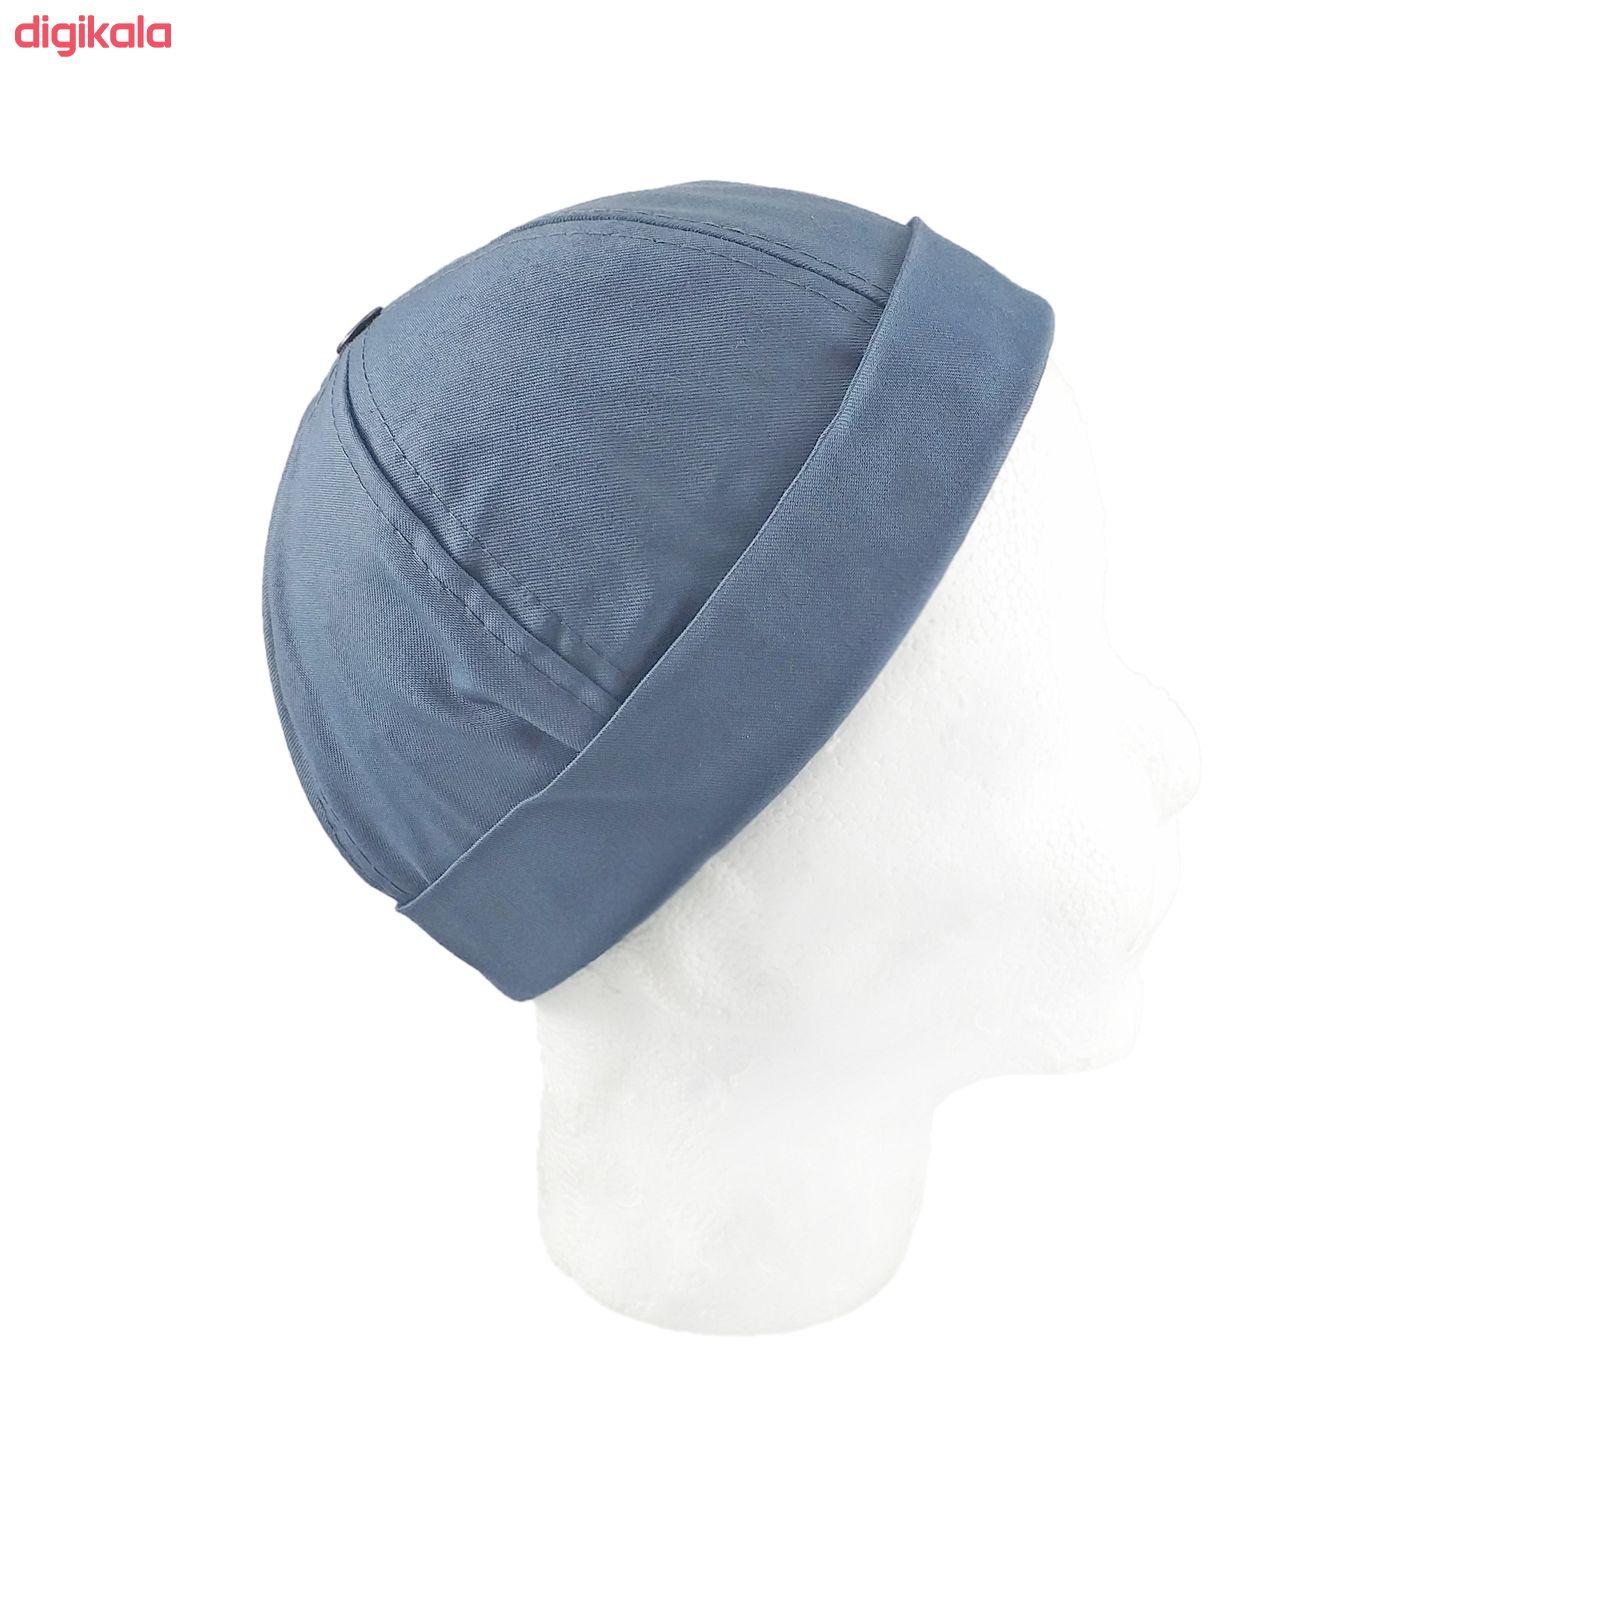 کلاه لئونی مردانه مدل BSOR77 main 1 3